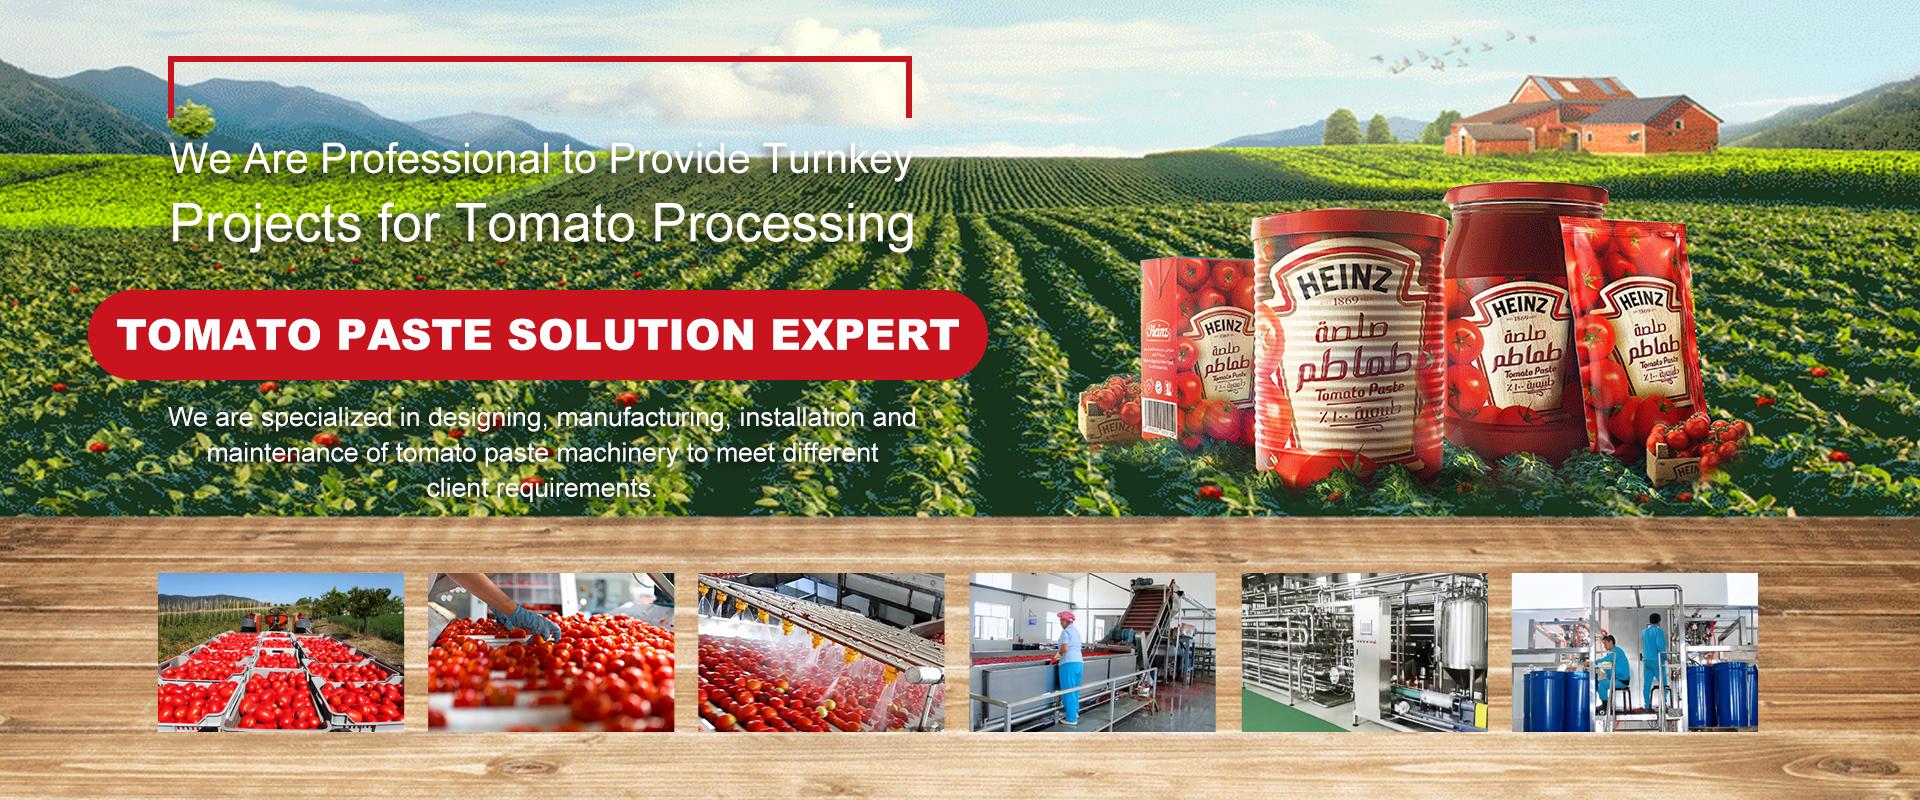 Tomato Paste Solution Expert